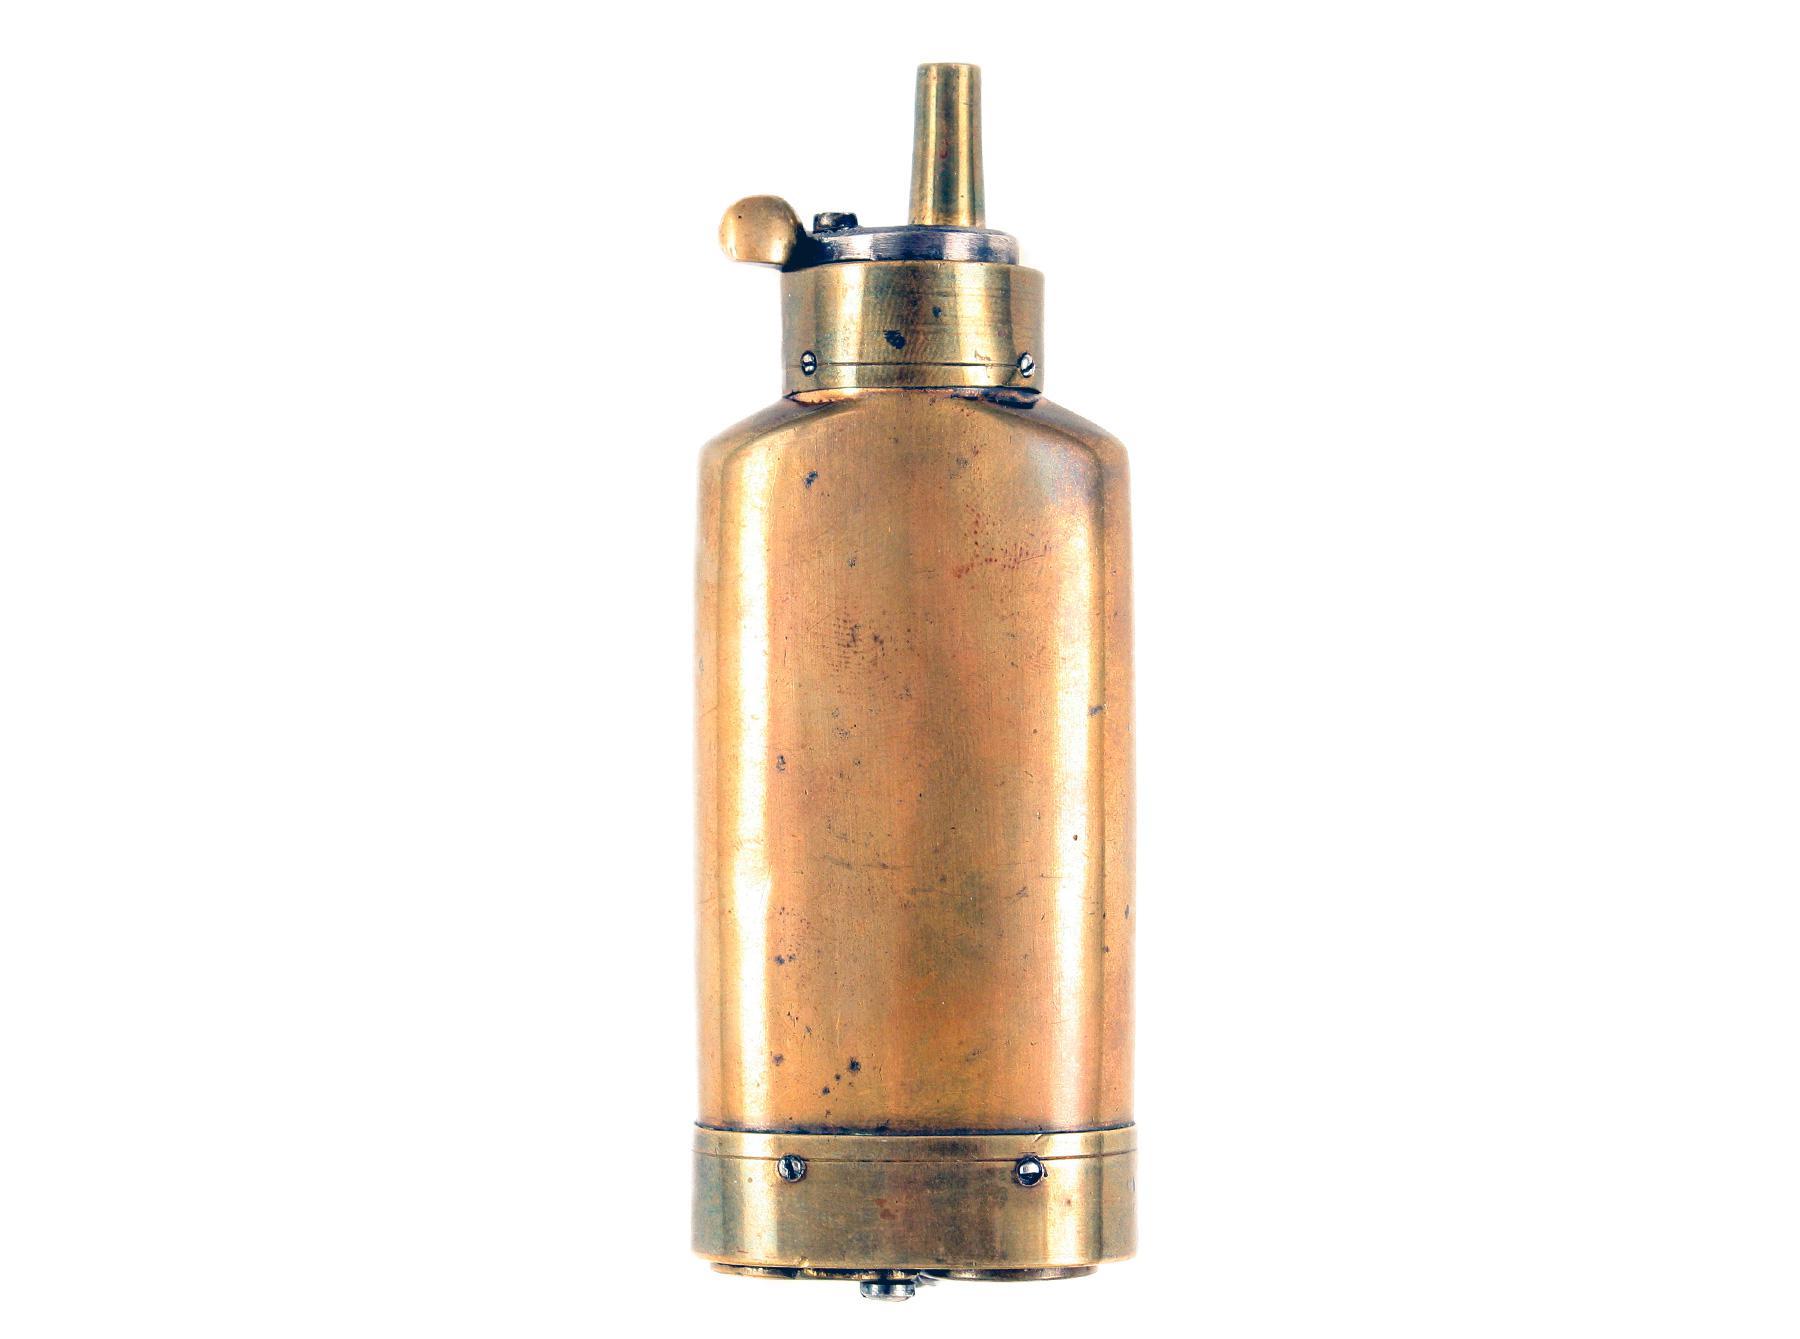 A 'Batty' Three-Way Flask